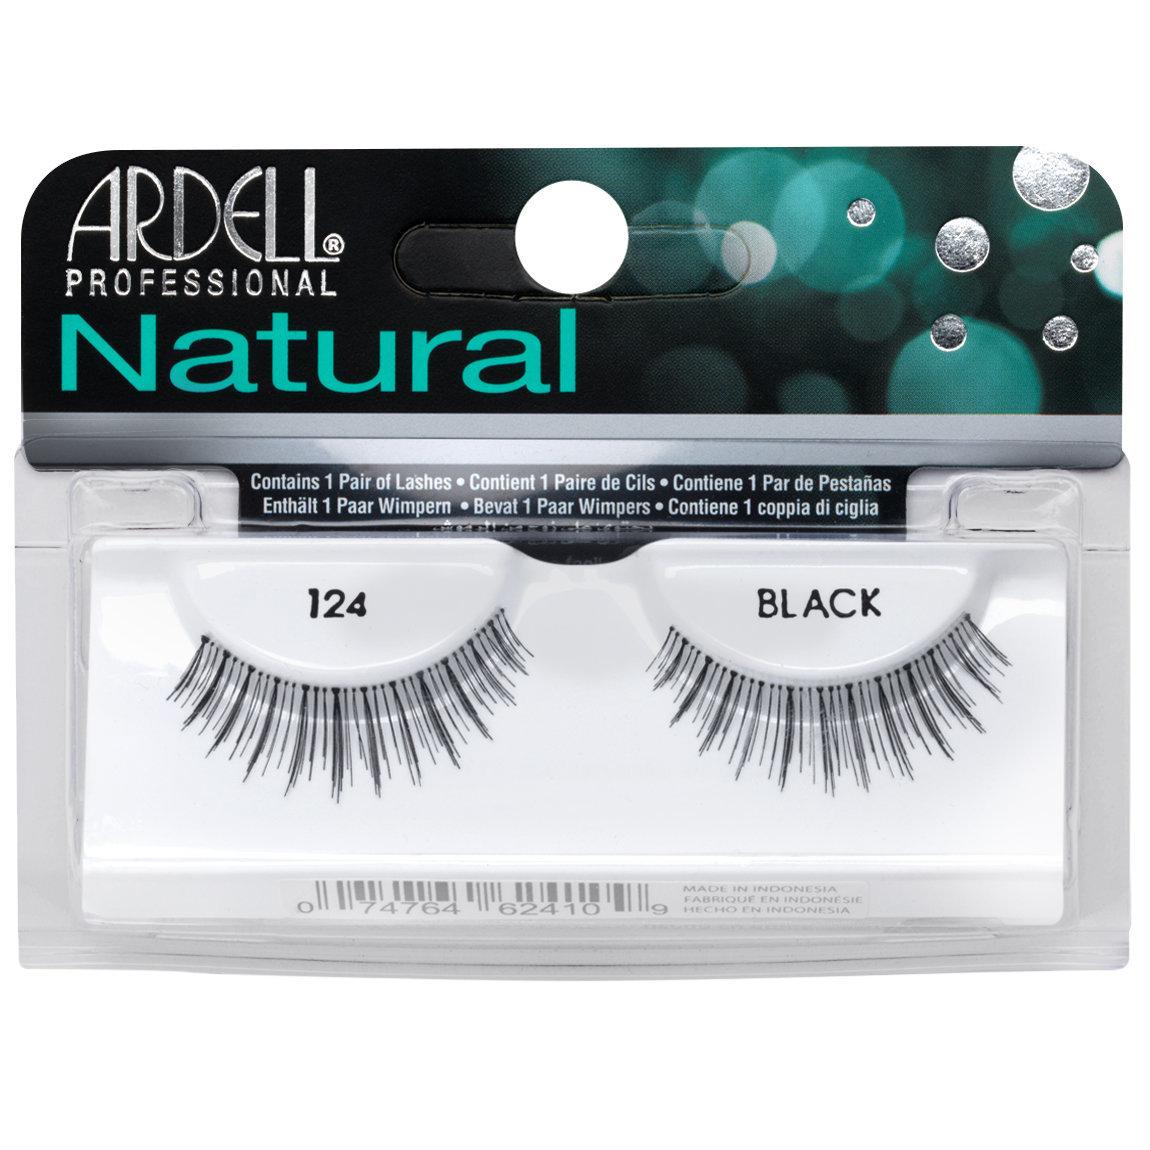 cb33309159d Ardell Natural Lashes 124 Black | Beautylish